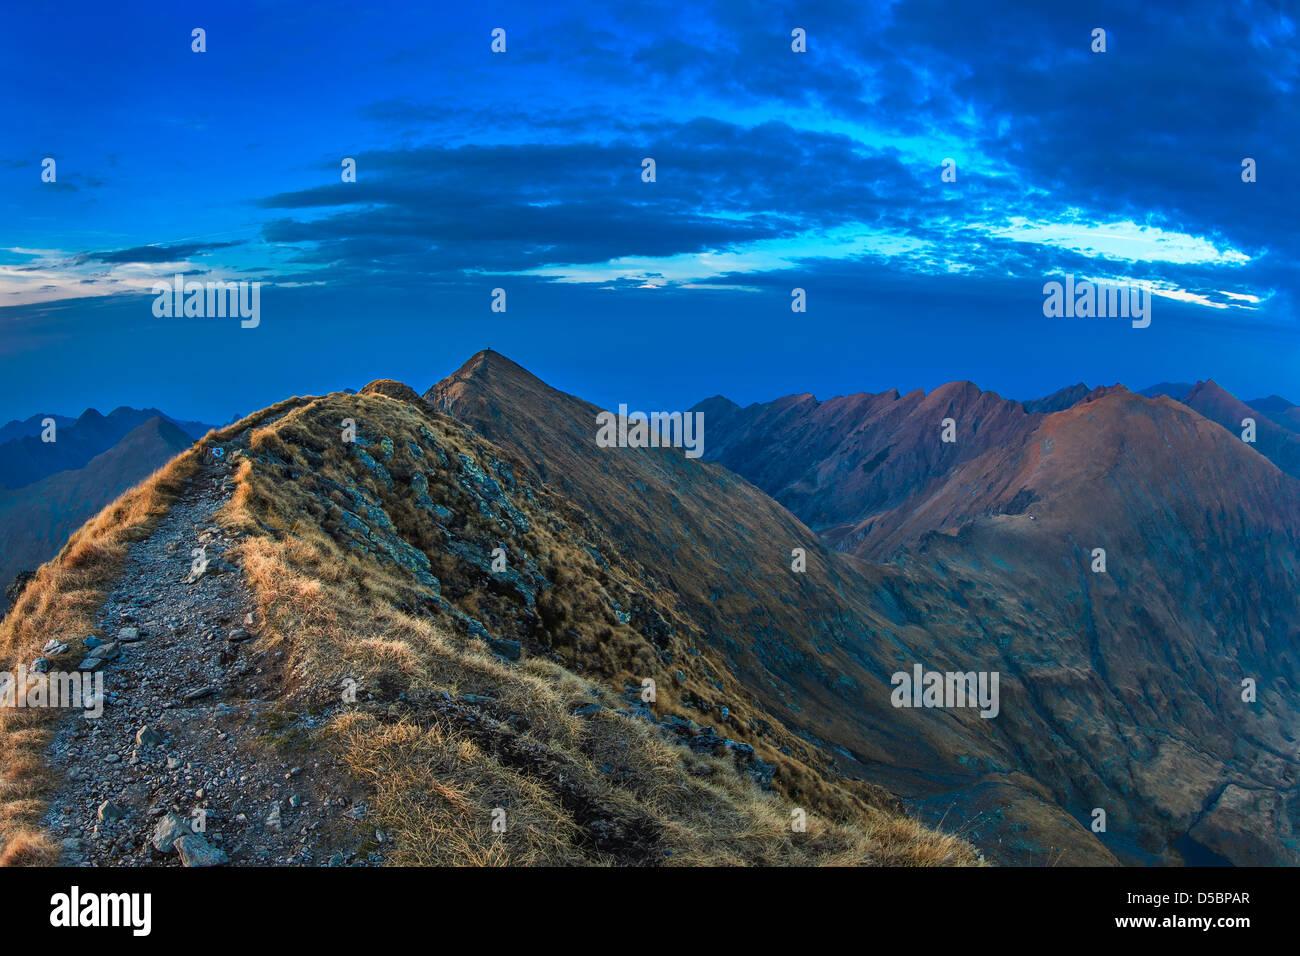 Fagaras Mountains, Southern Carpathians - Stock Image